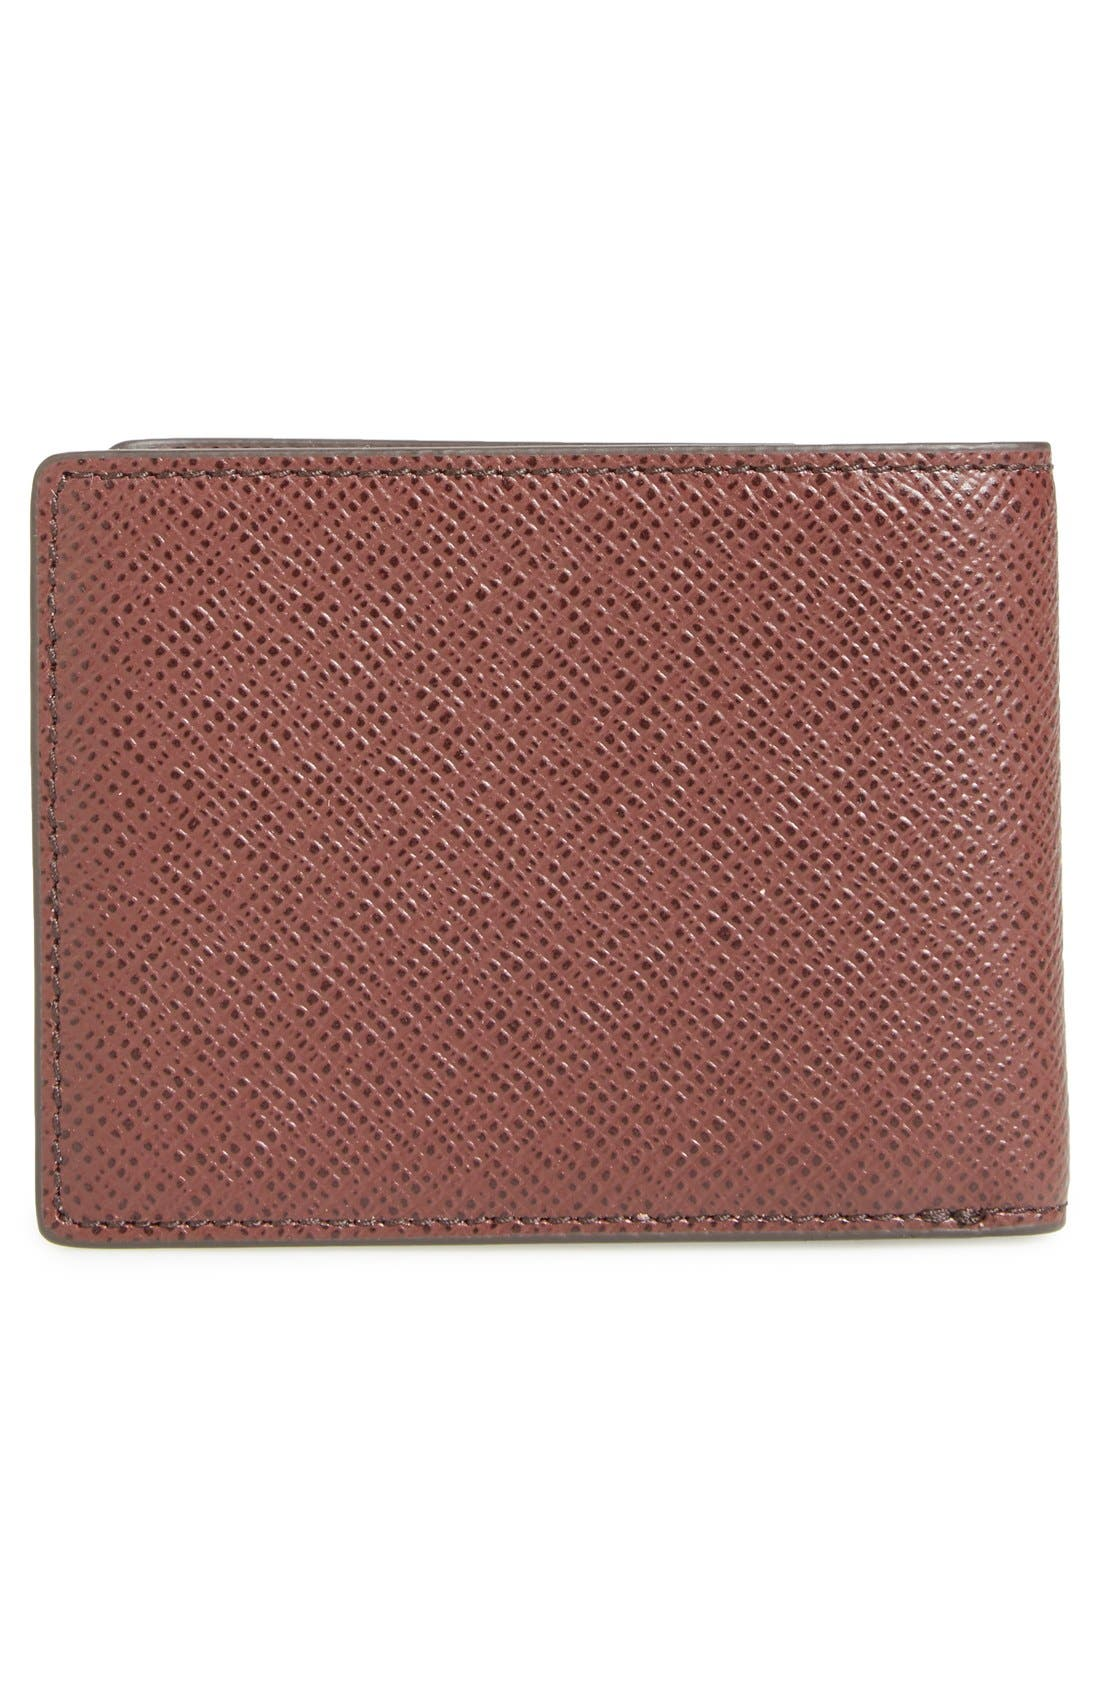 Alternate Image 3  - BOSS 'Signature' Bifold Calfskin Leather Wallet